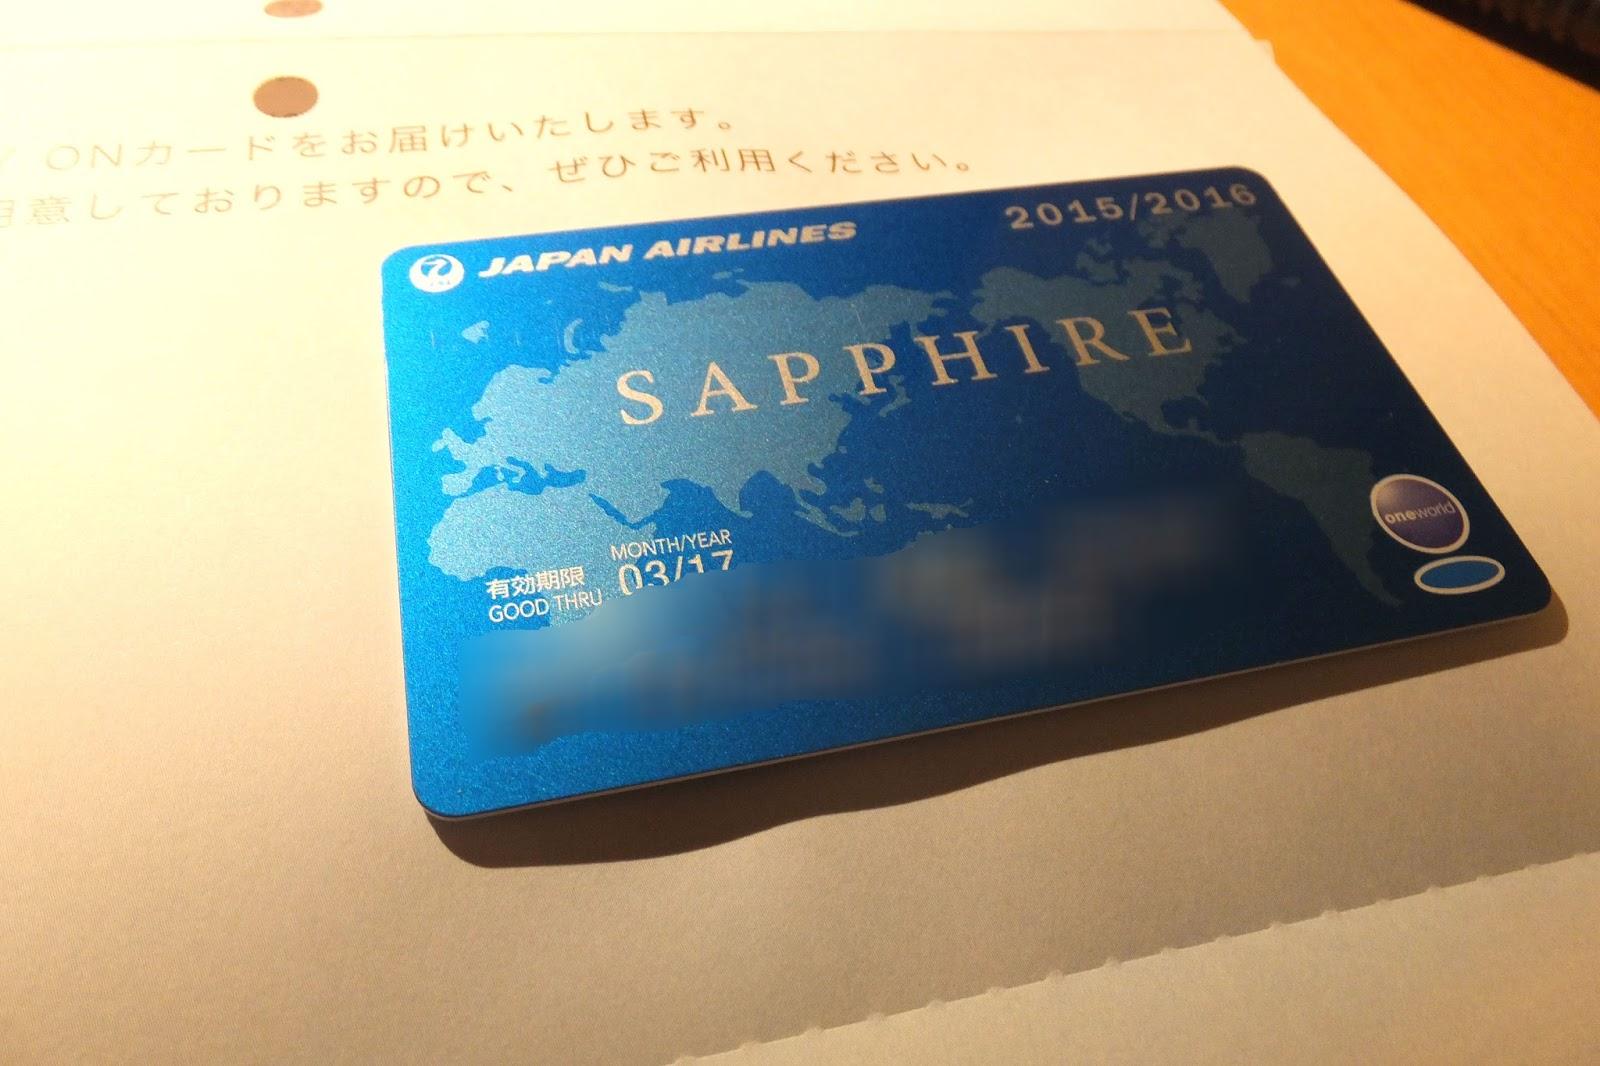 jmb sapphire card JMBサイファアカード